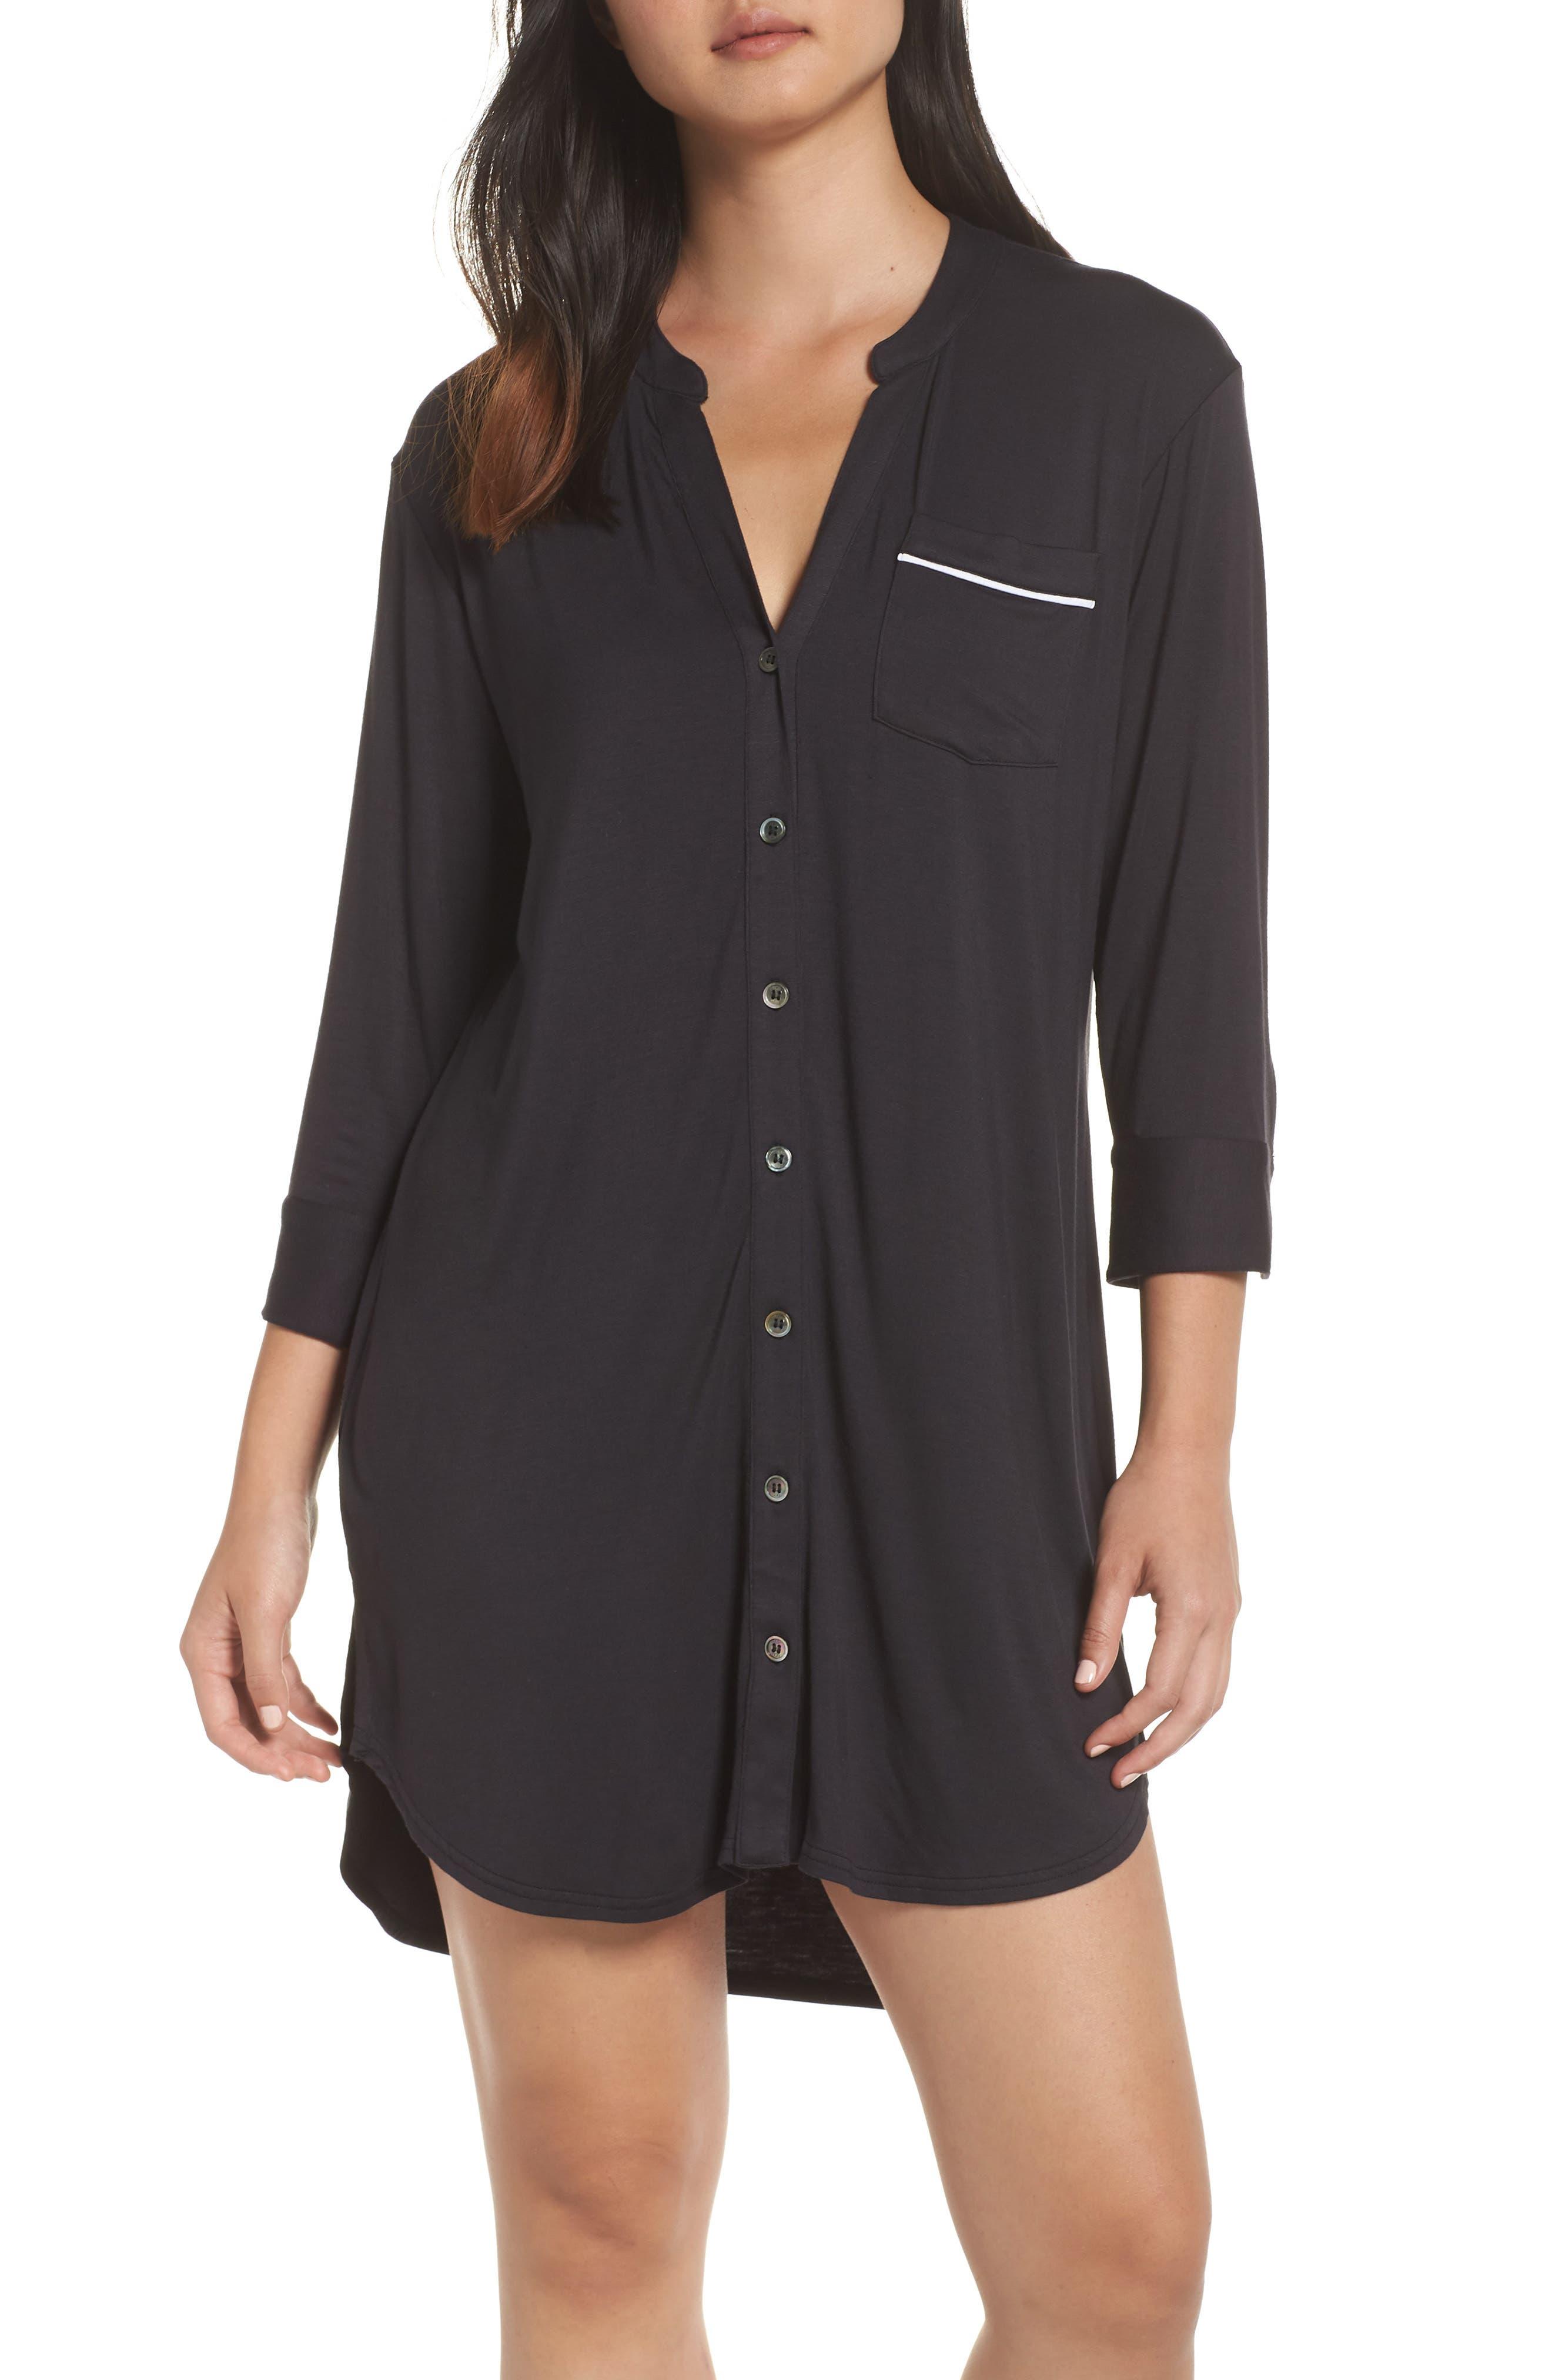 UGG<SUP>®</SUP>, Vivian Sleep Shirt, Main thumbnail 1, color, BLACK